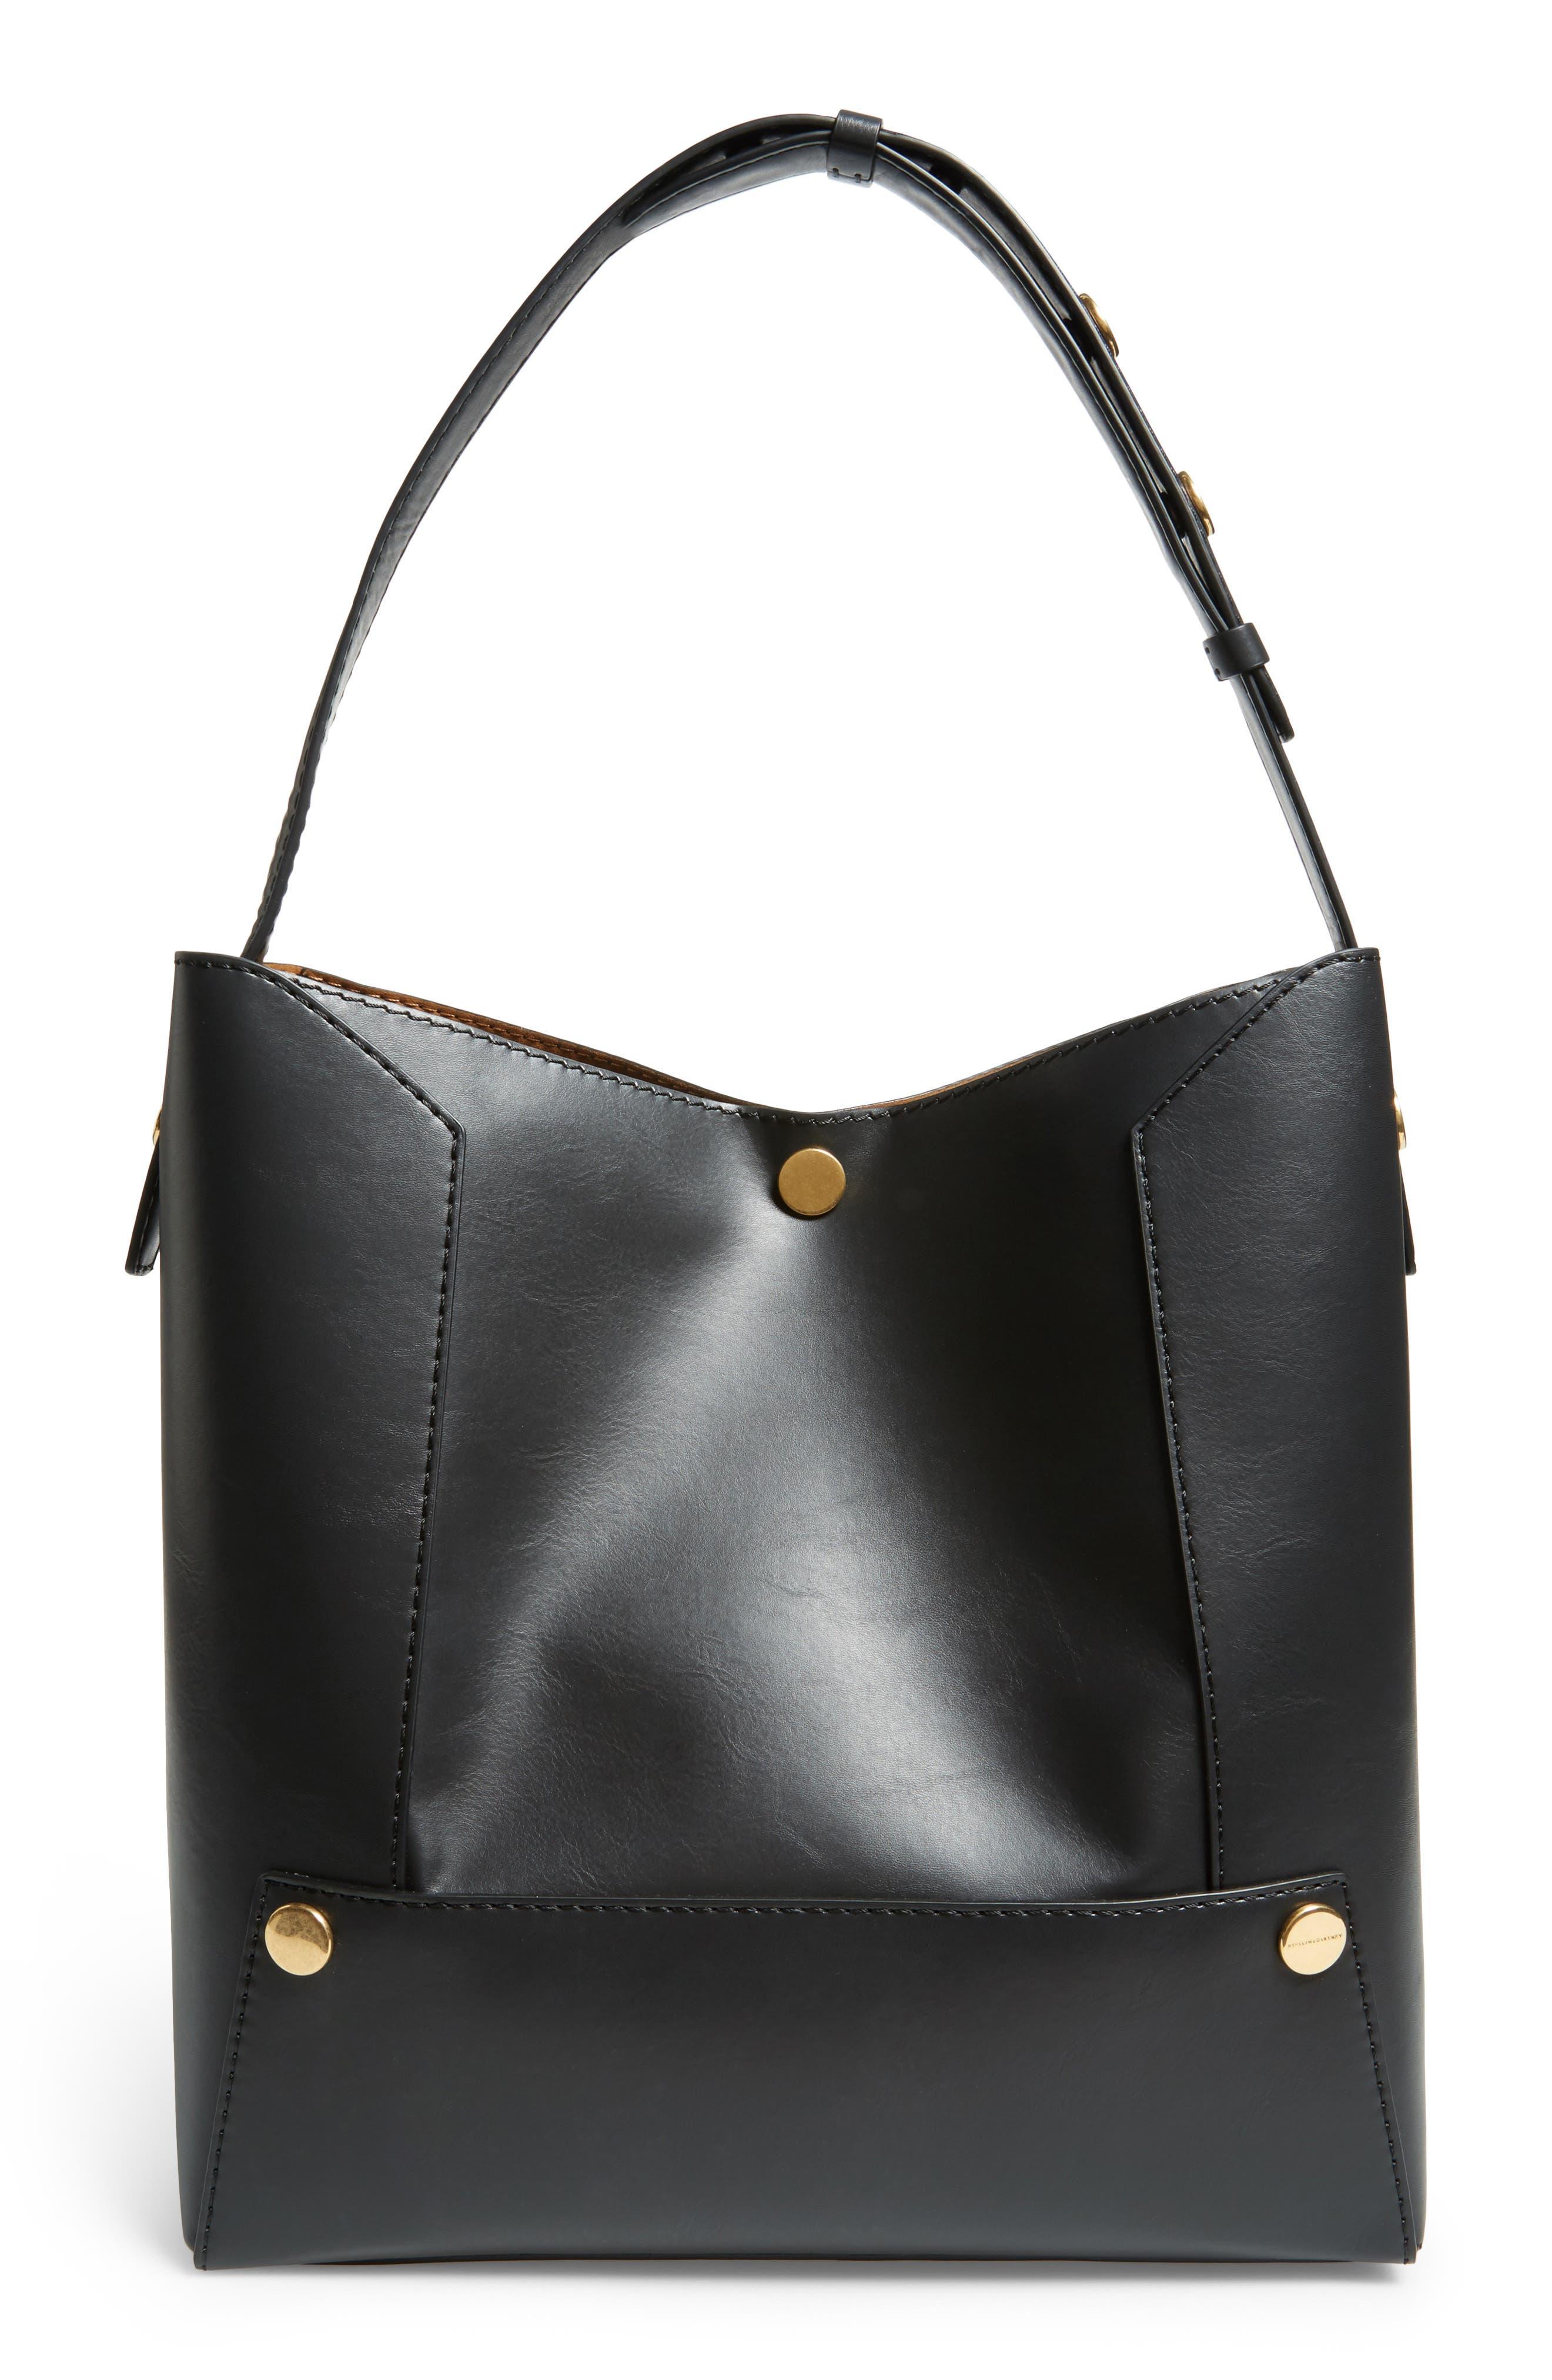 Stella McCartney Faux Leather Bucket Bag